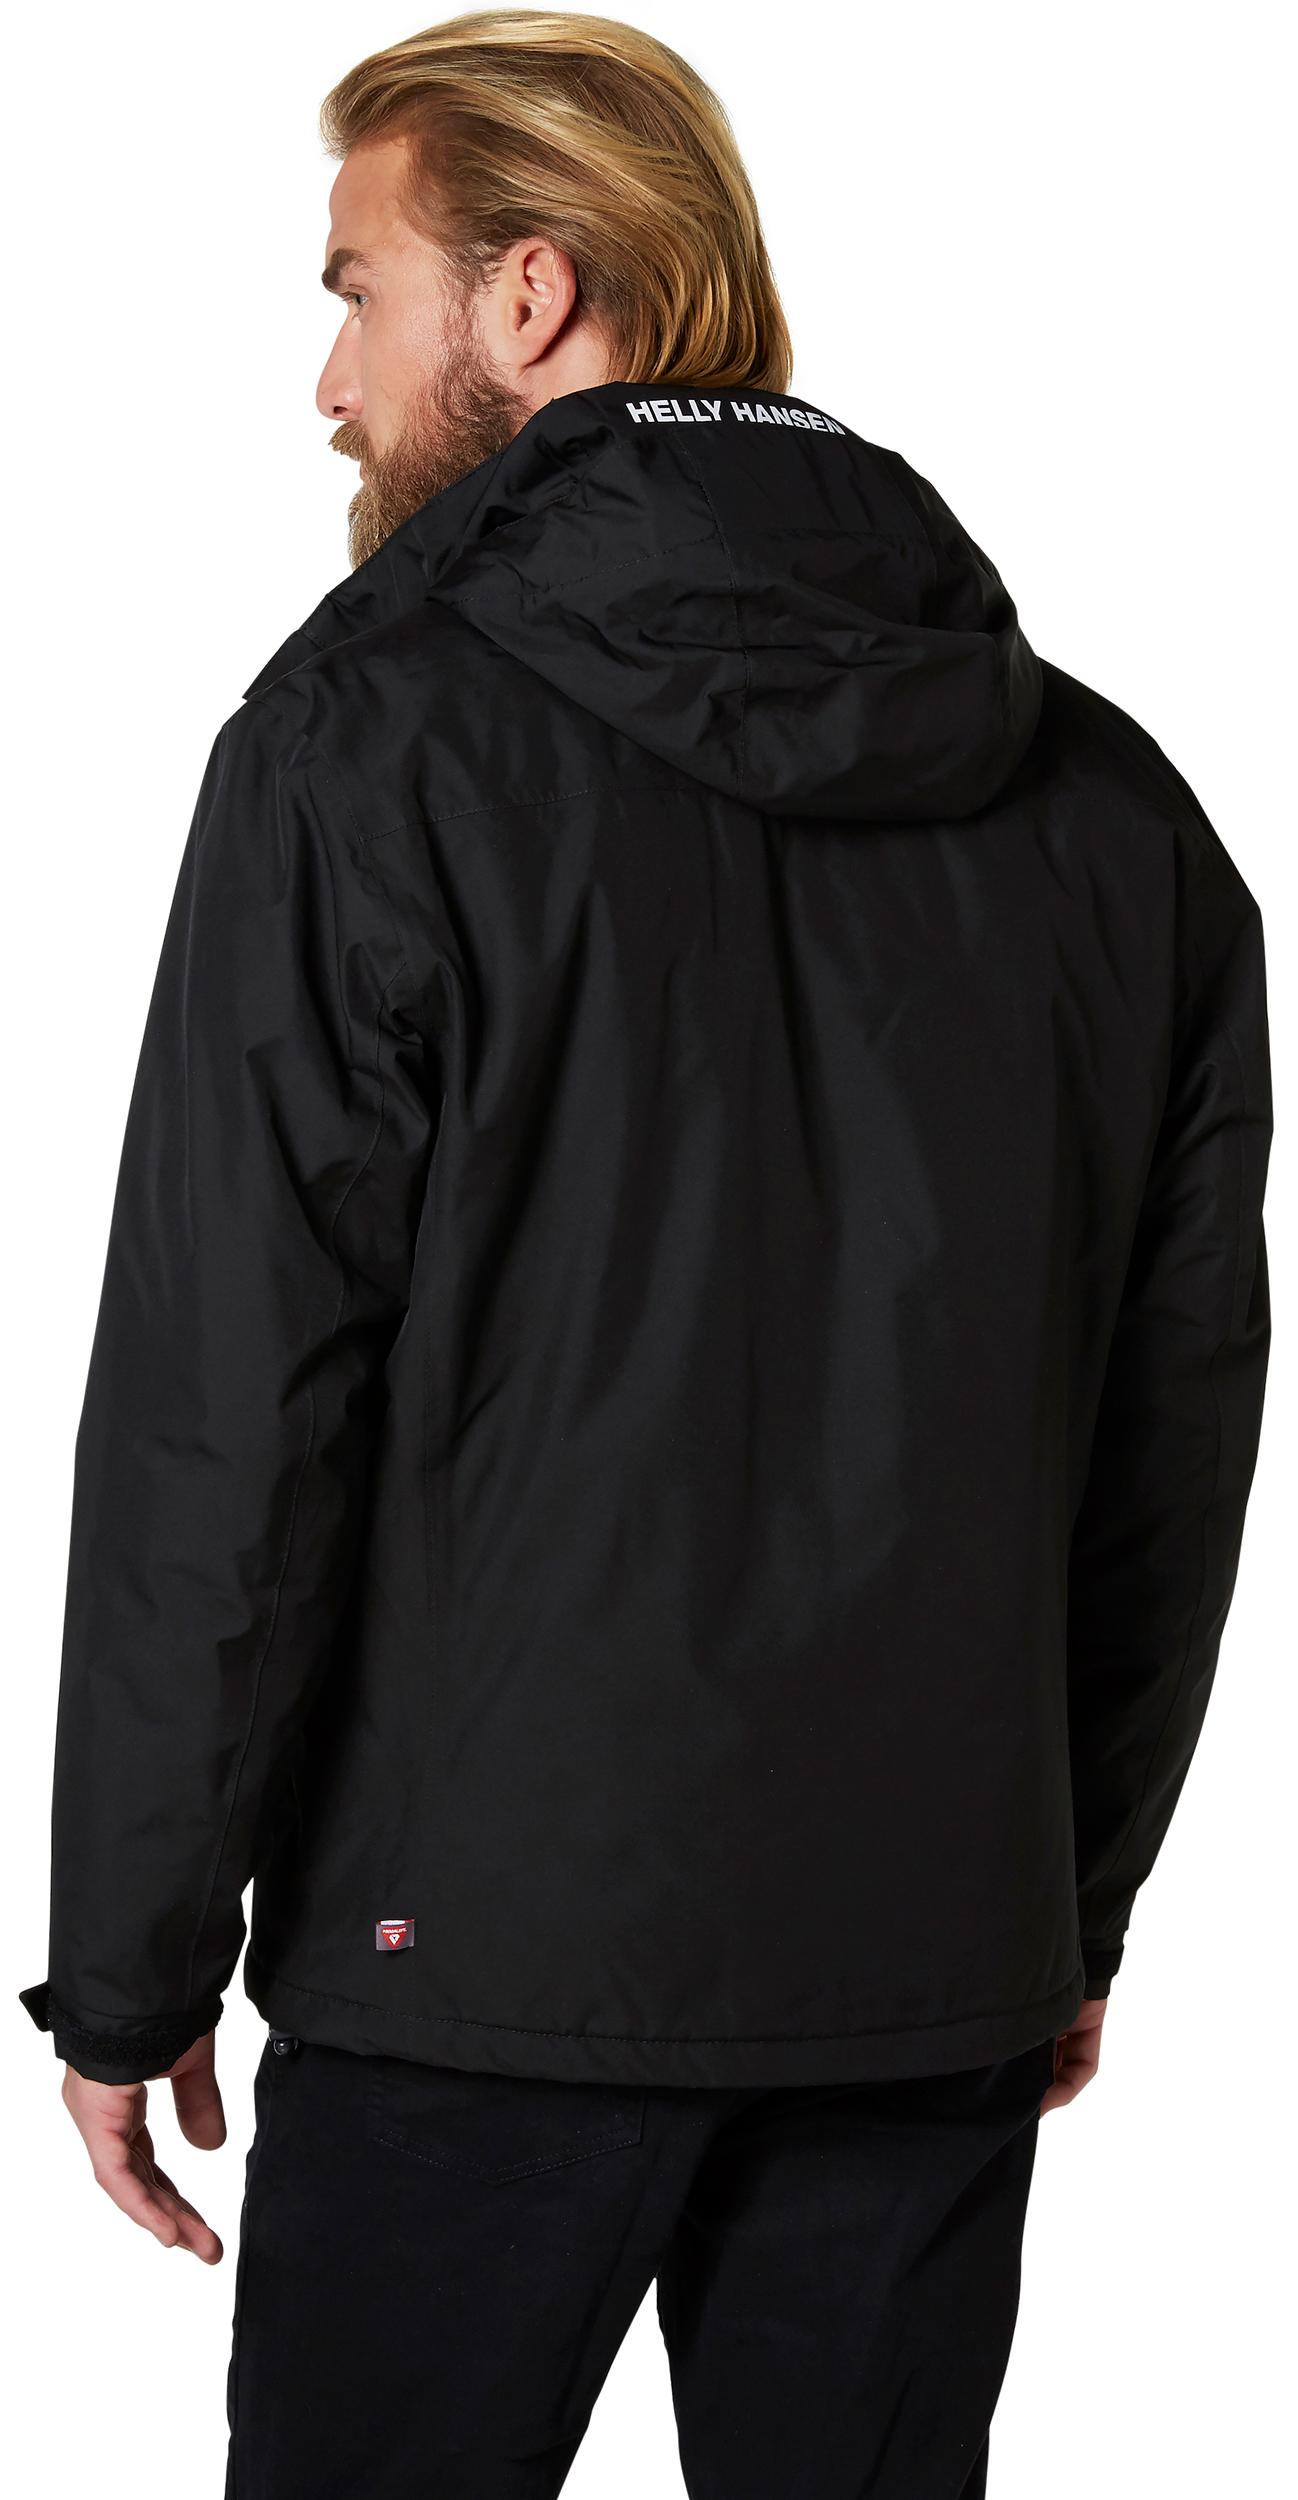 no sale tax classic chic shop Helly Hansen Dubliner Insulated Jacket - Men's   MEC